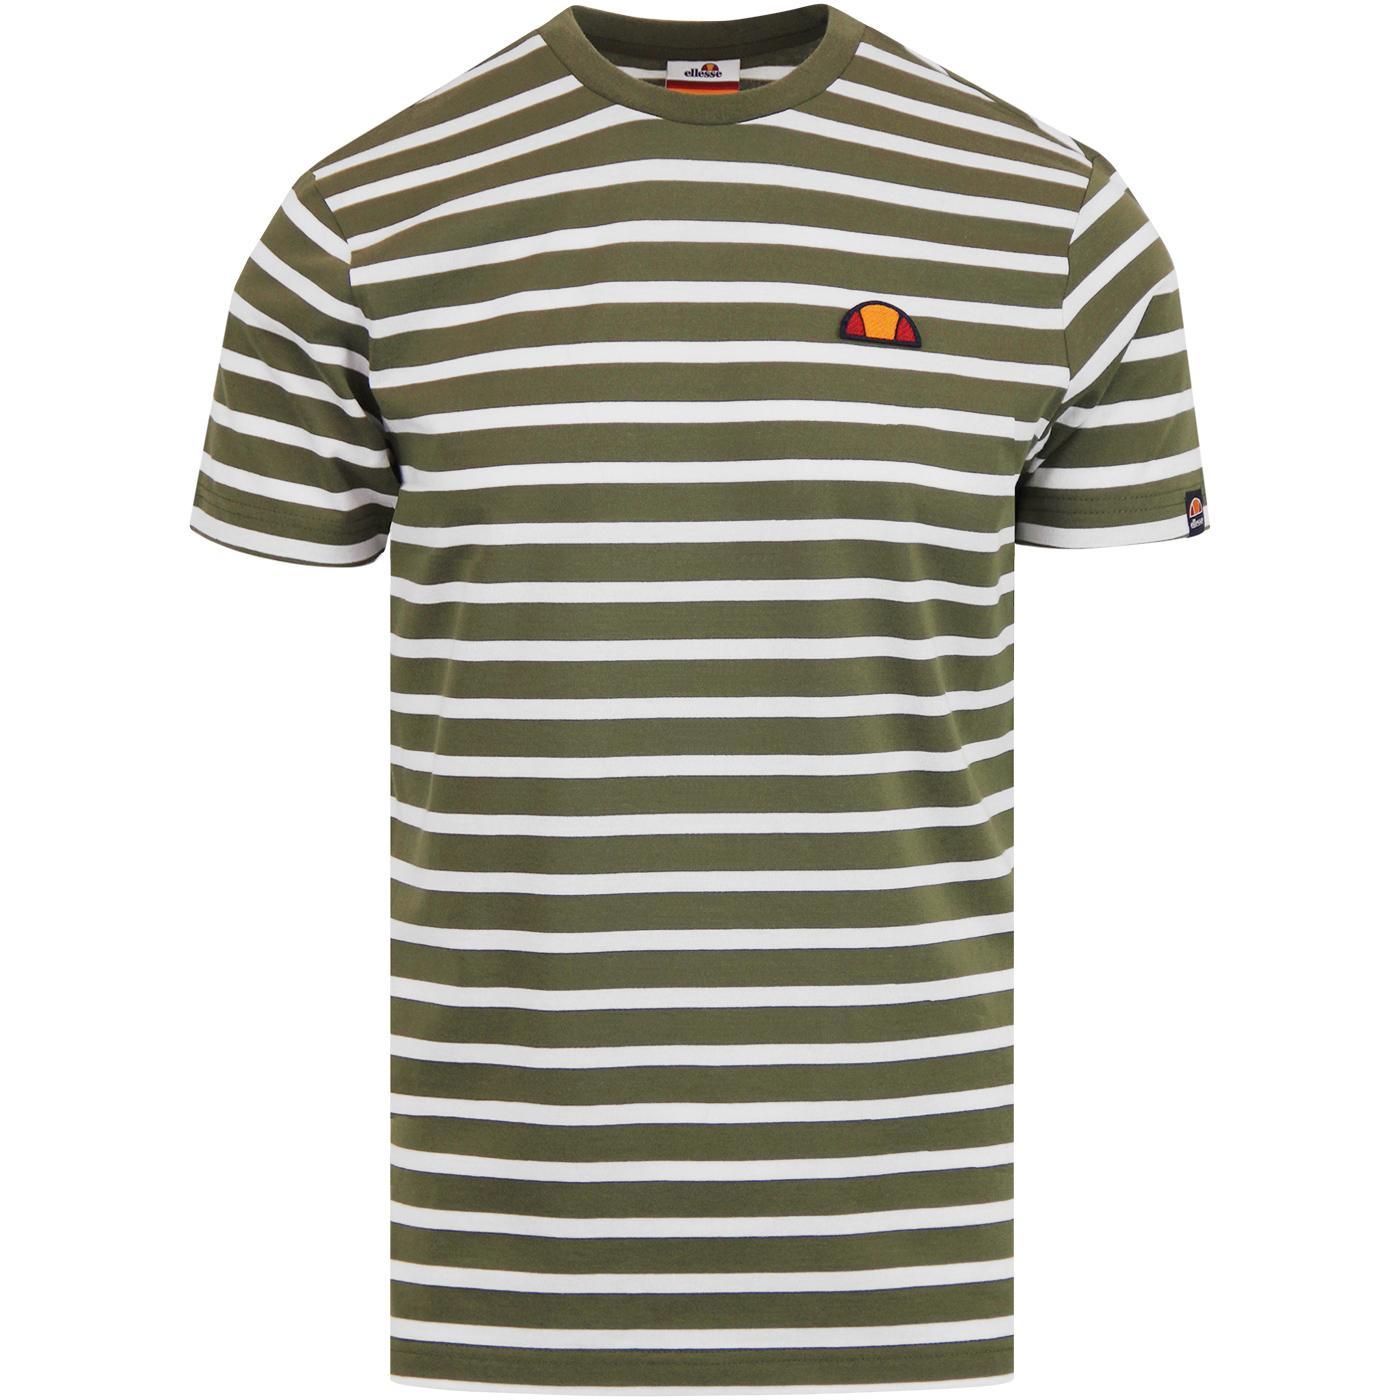 Sailo ELLESSE Mens Retro Breton Stripe T-Shirt K